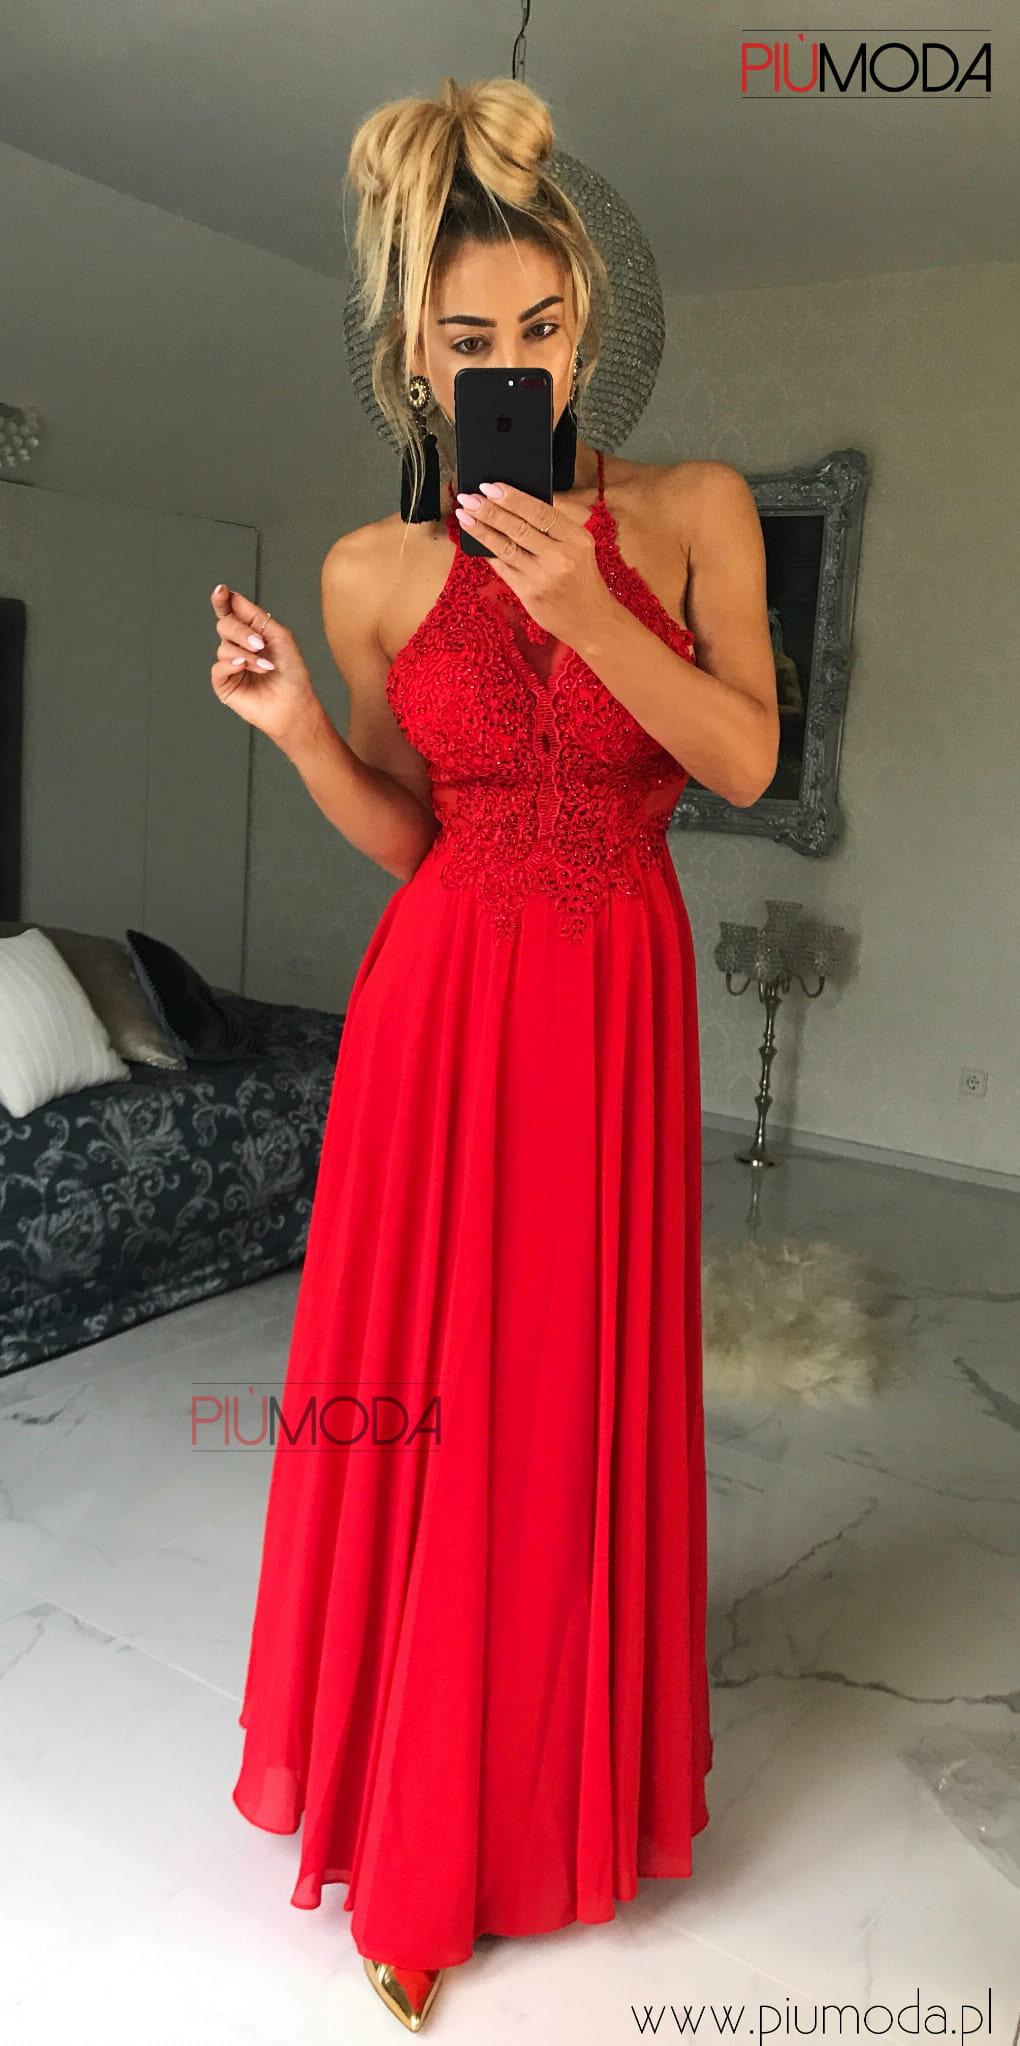 Mercedes elegancka, długa suknia czerwona